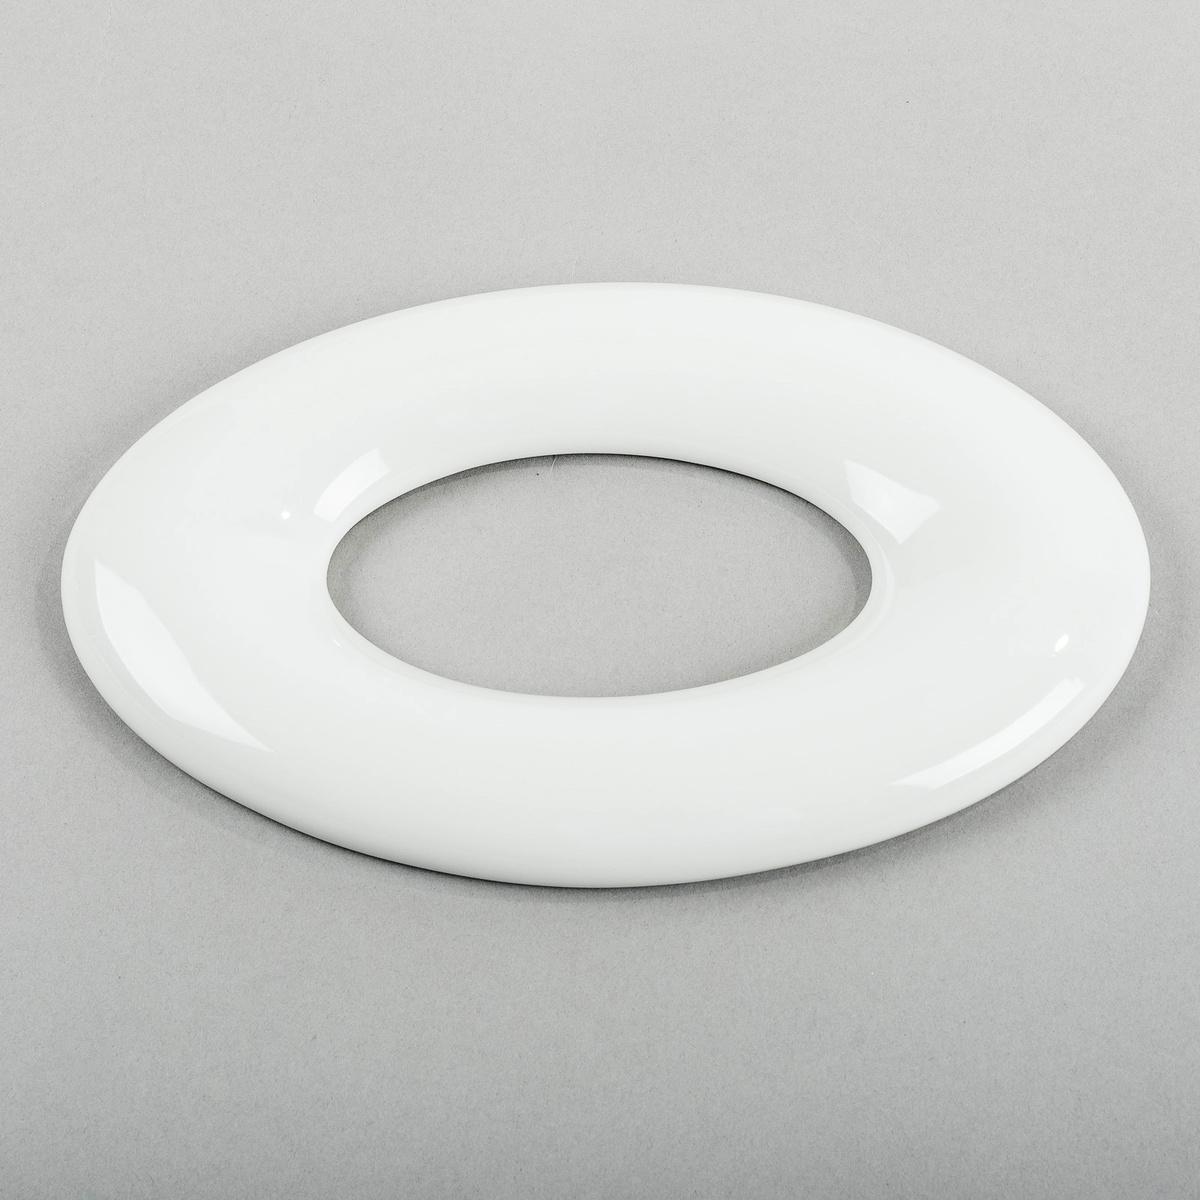 Studio Pirsc Porcelain 3D tapeta OVAL 24 cm, biela